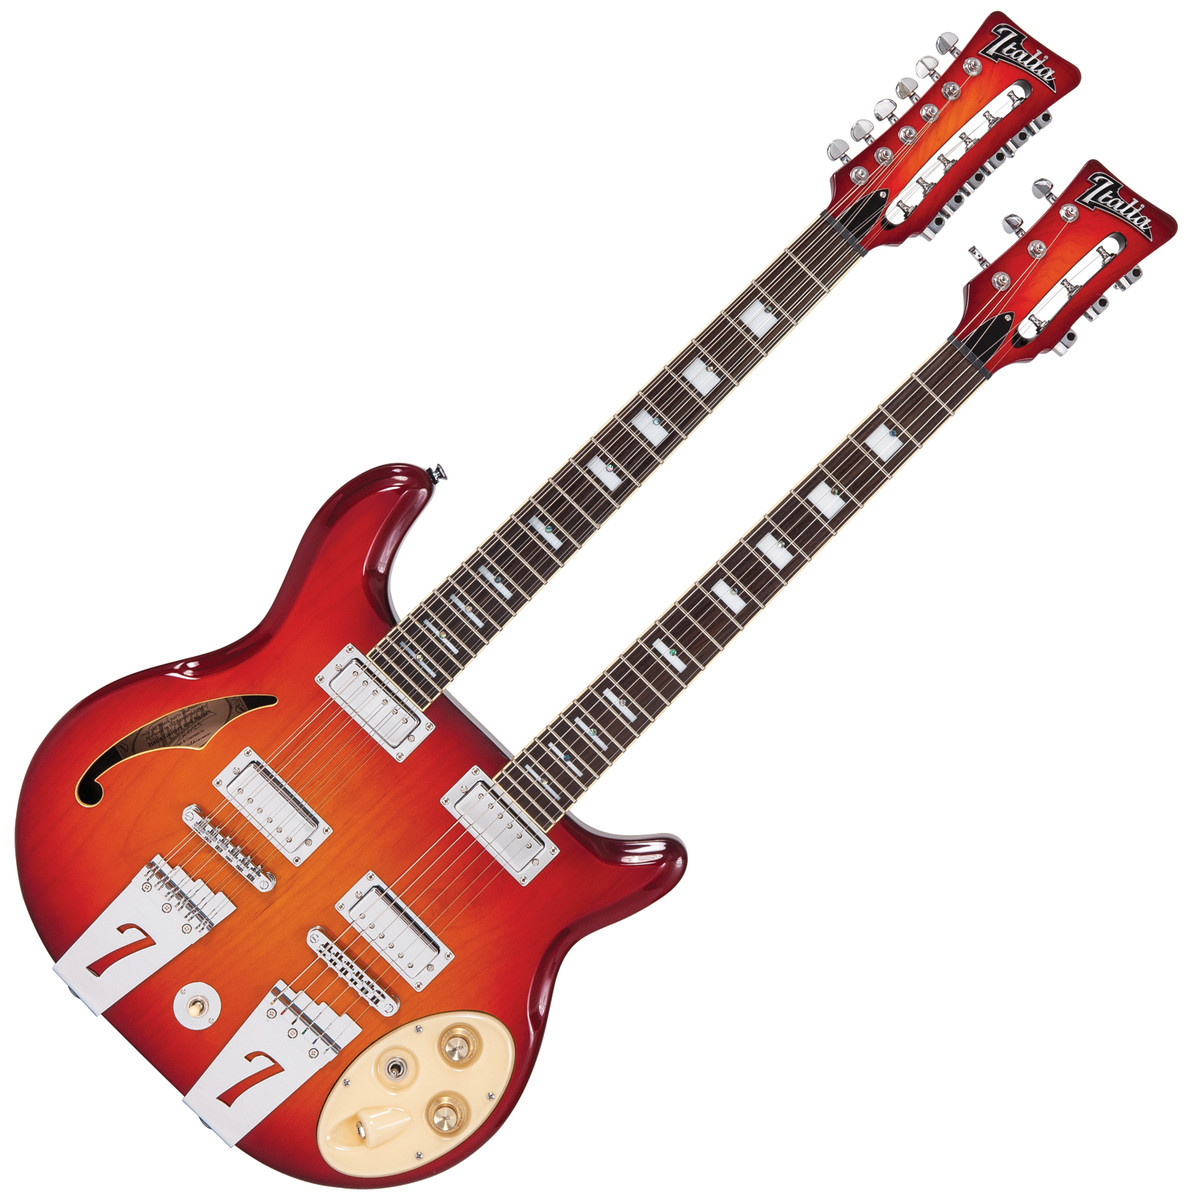 italia rimini double neck semi hollow body guitar cherry sunburst at. Black Bedroom Furniture Sets. Home Design Ideas